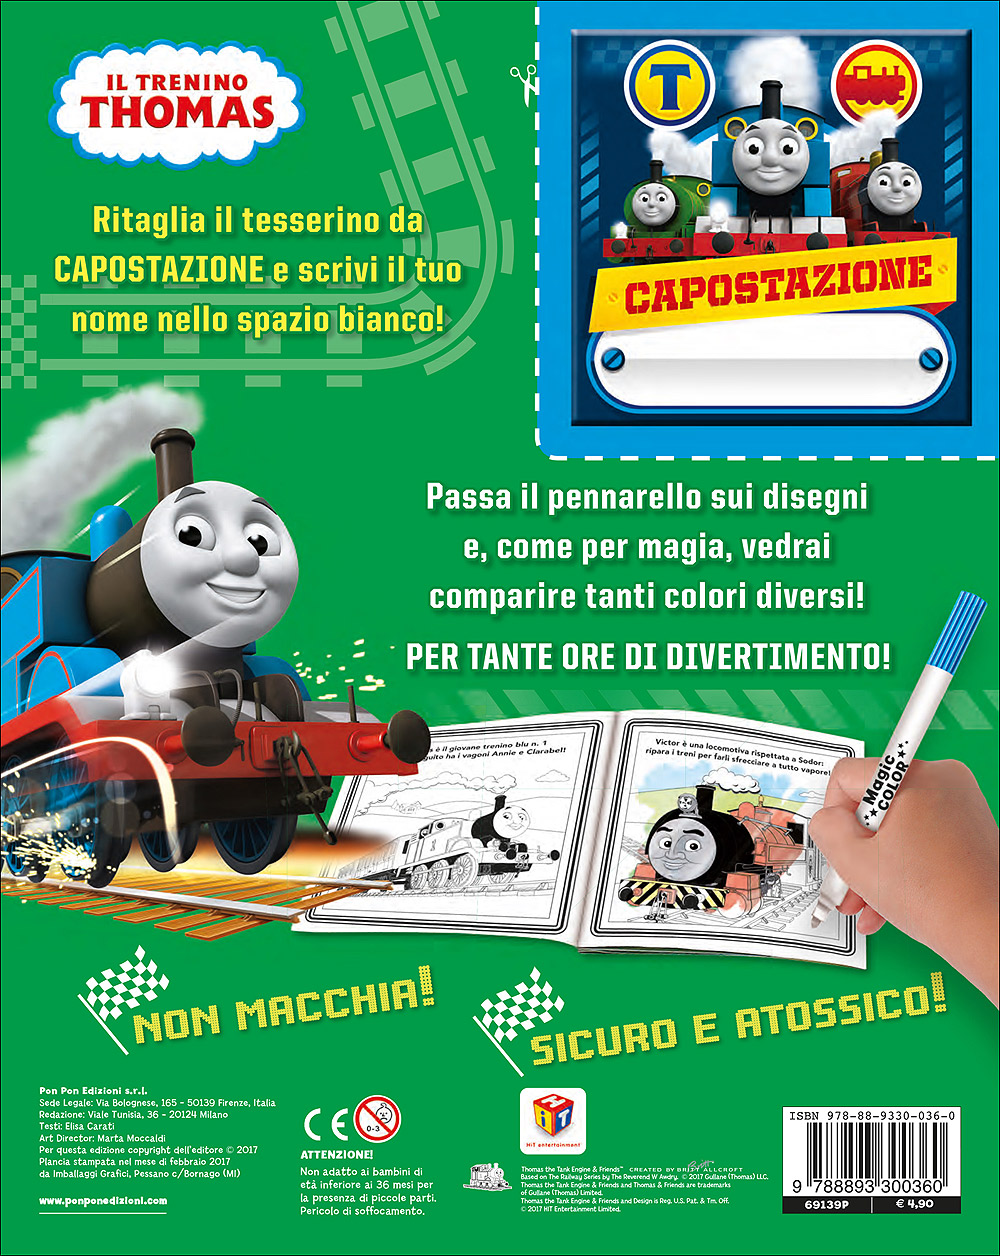 Albo Magico Trenino Thomas - Vagoni straordinari!